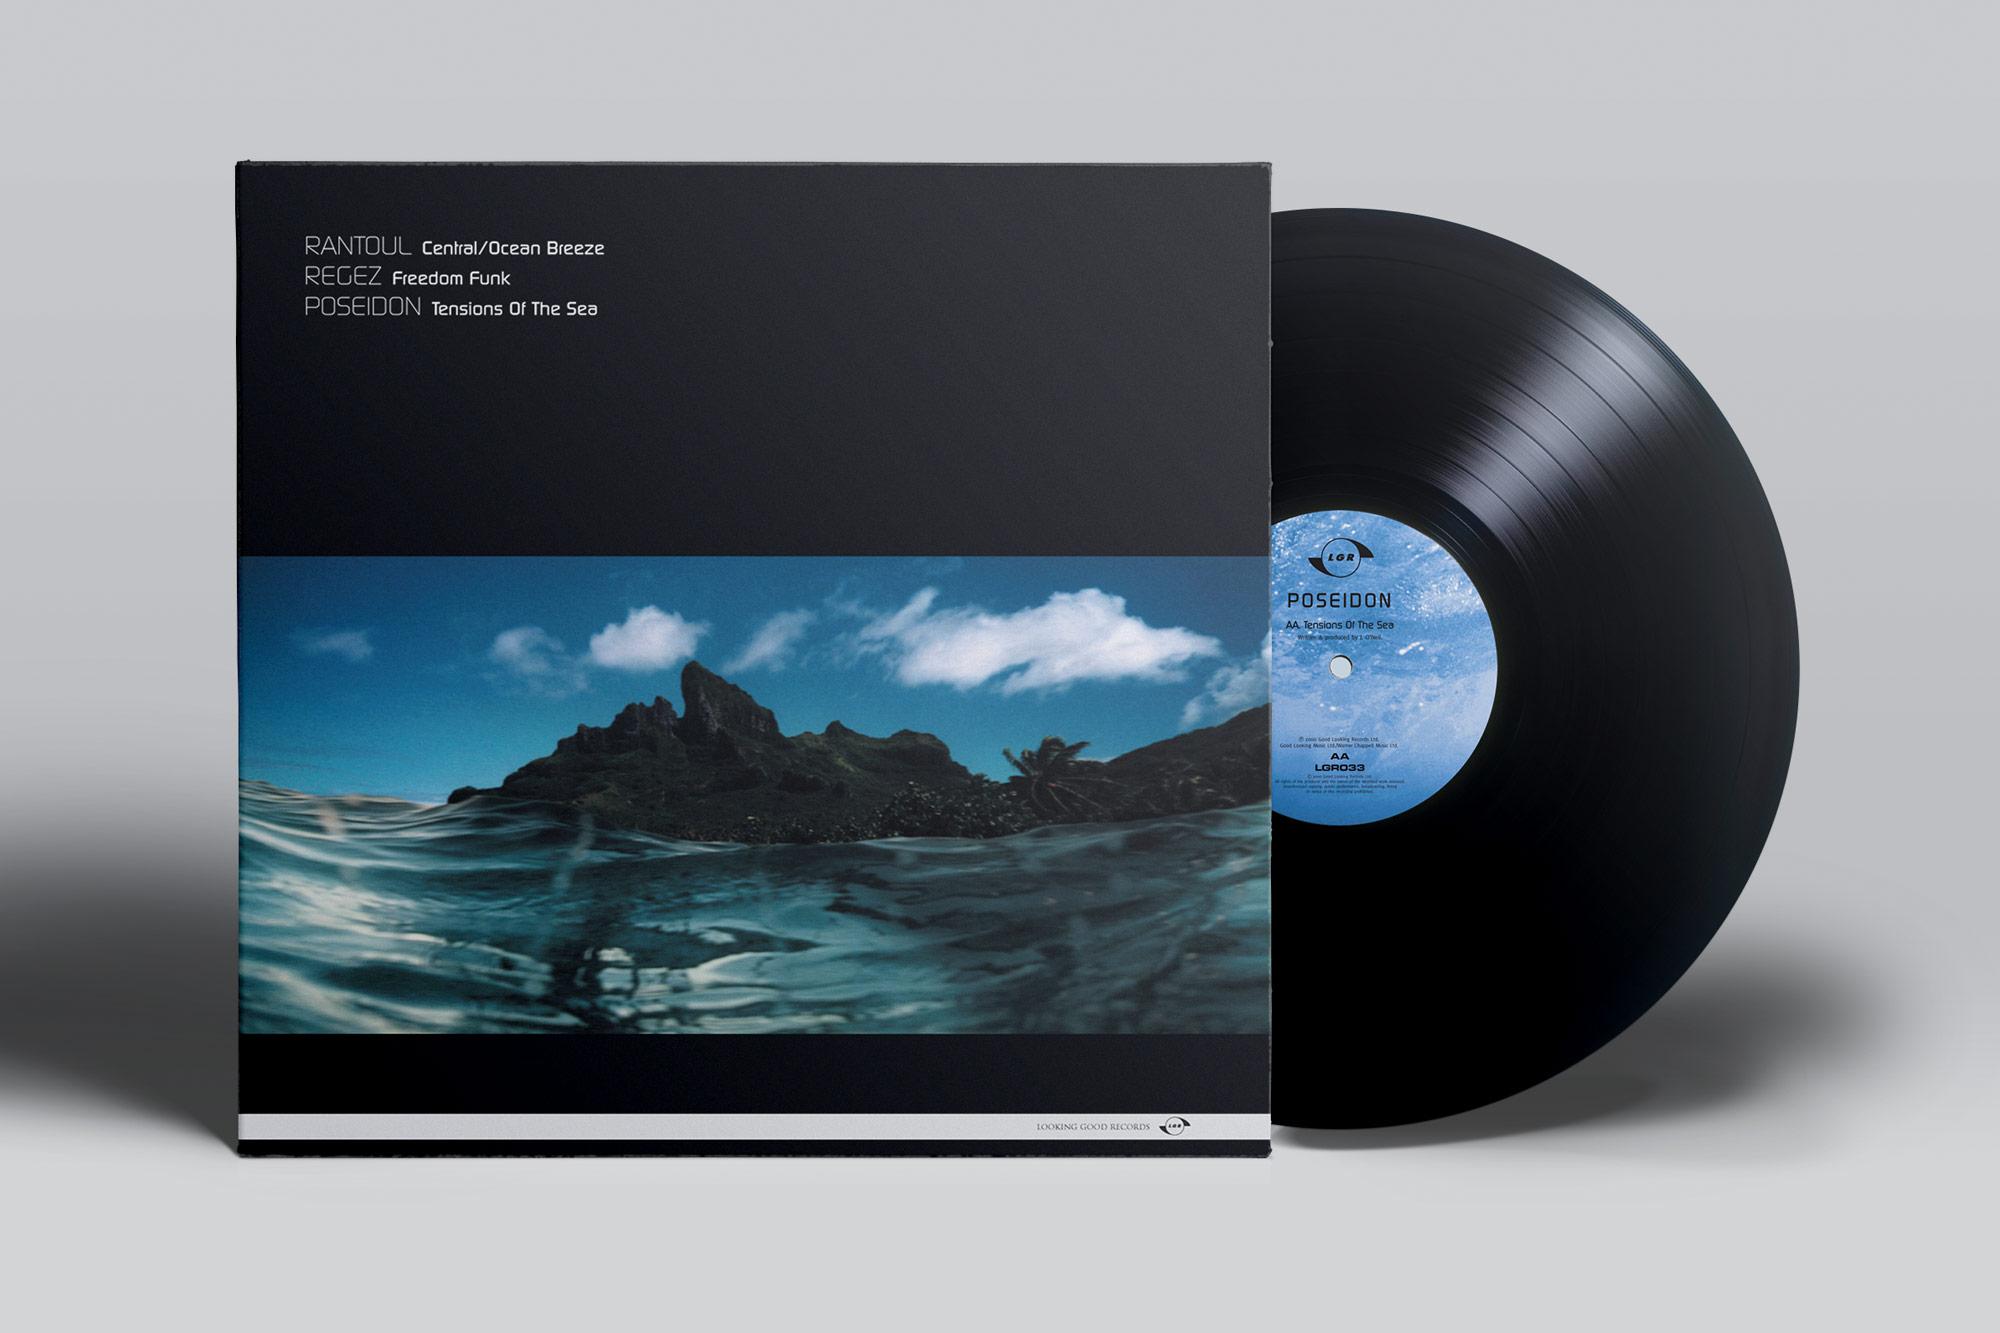 gareth-paul-jones-studio-design-looking-good-records-12-covers-cs-06-LGR032-LGR033